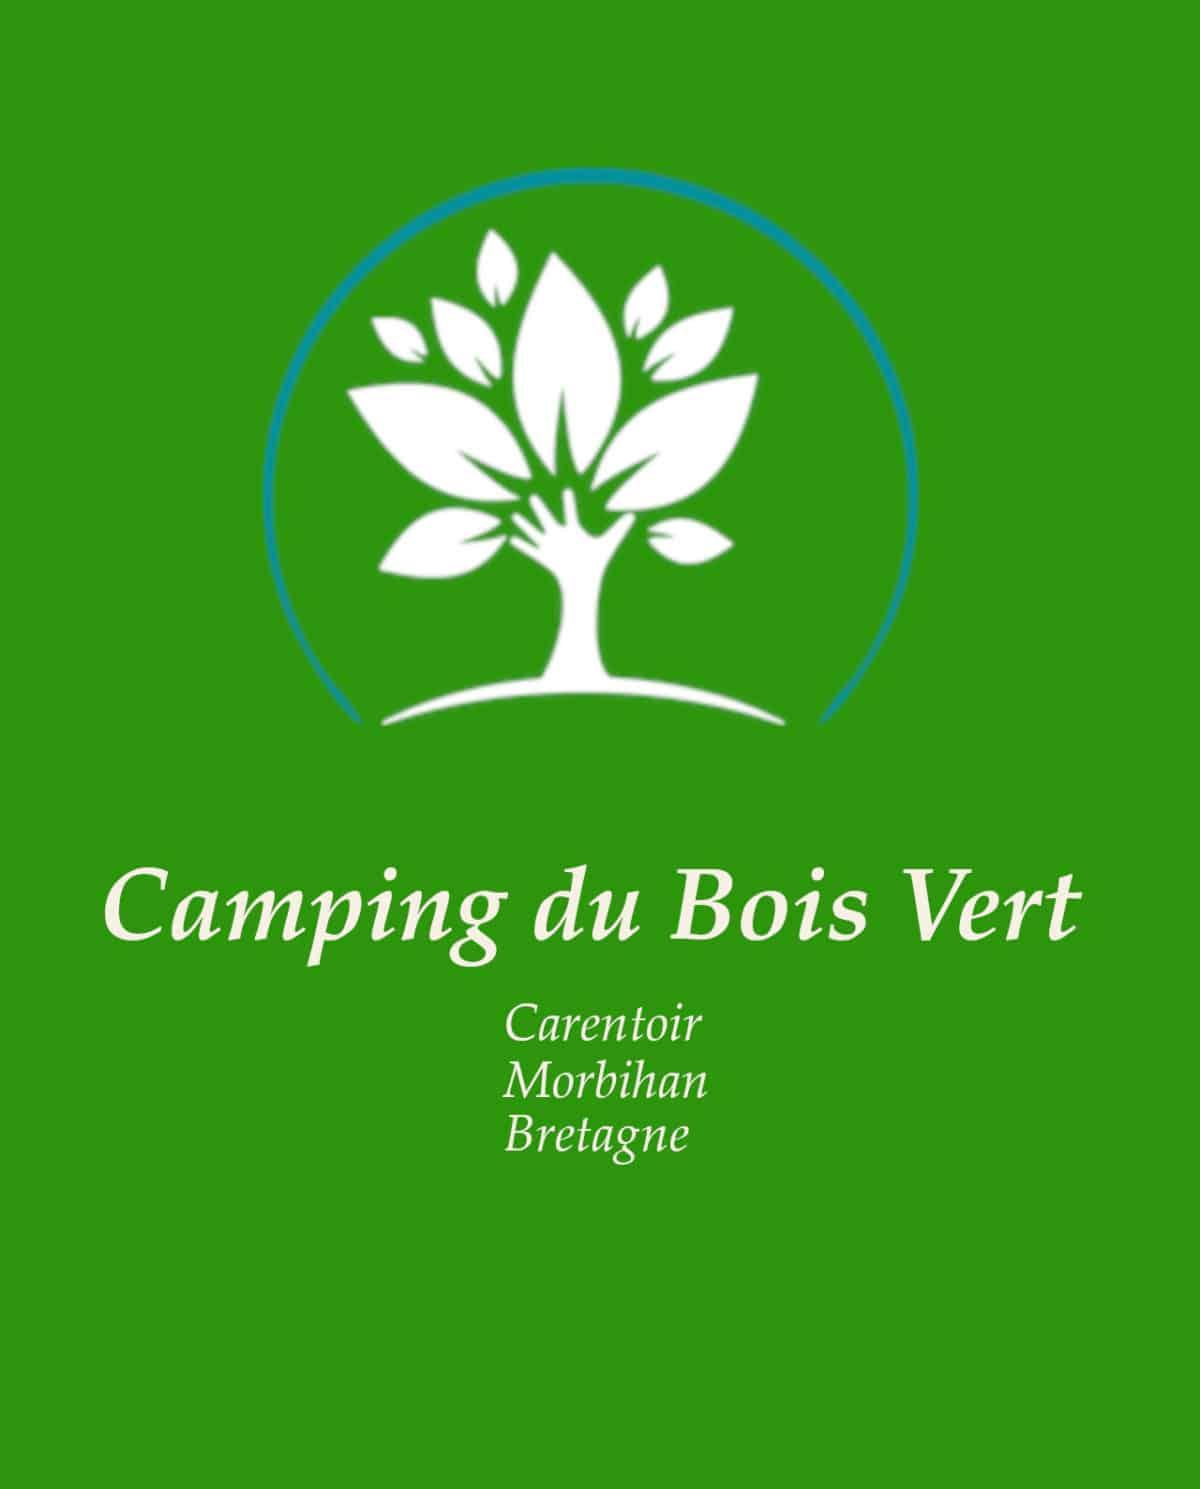 Camping du Bois Vert 2** – Carentoir – Morbihan